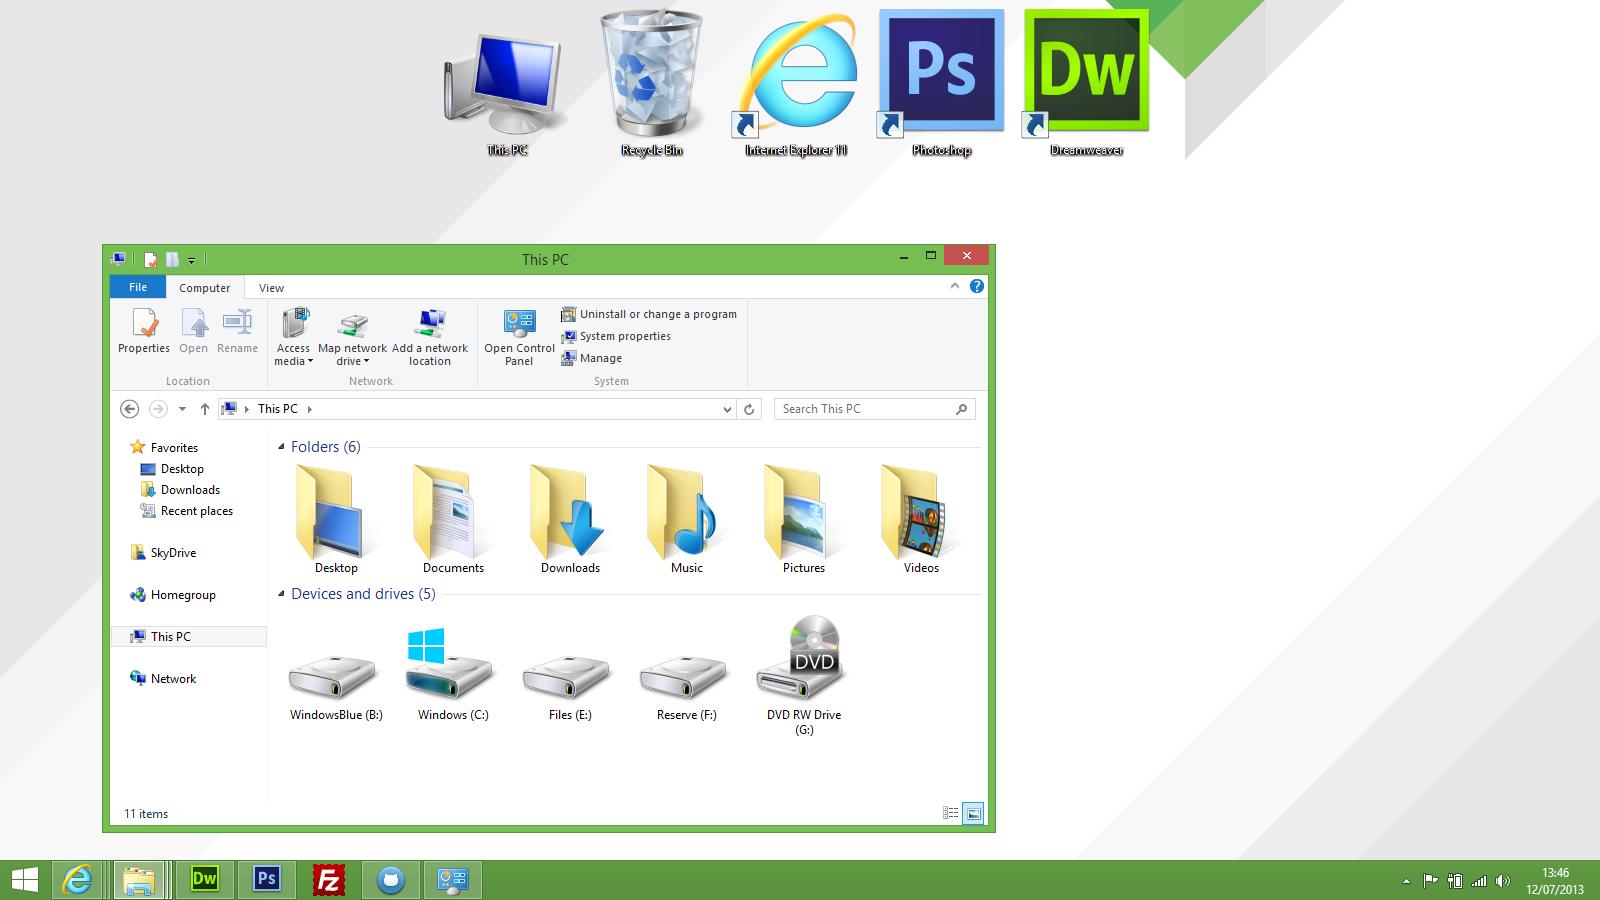 51dfecb9378d0-windows.png